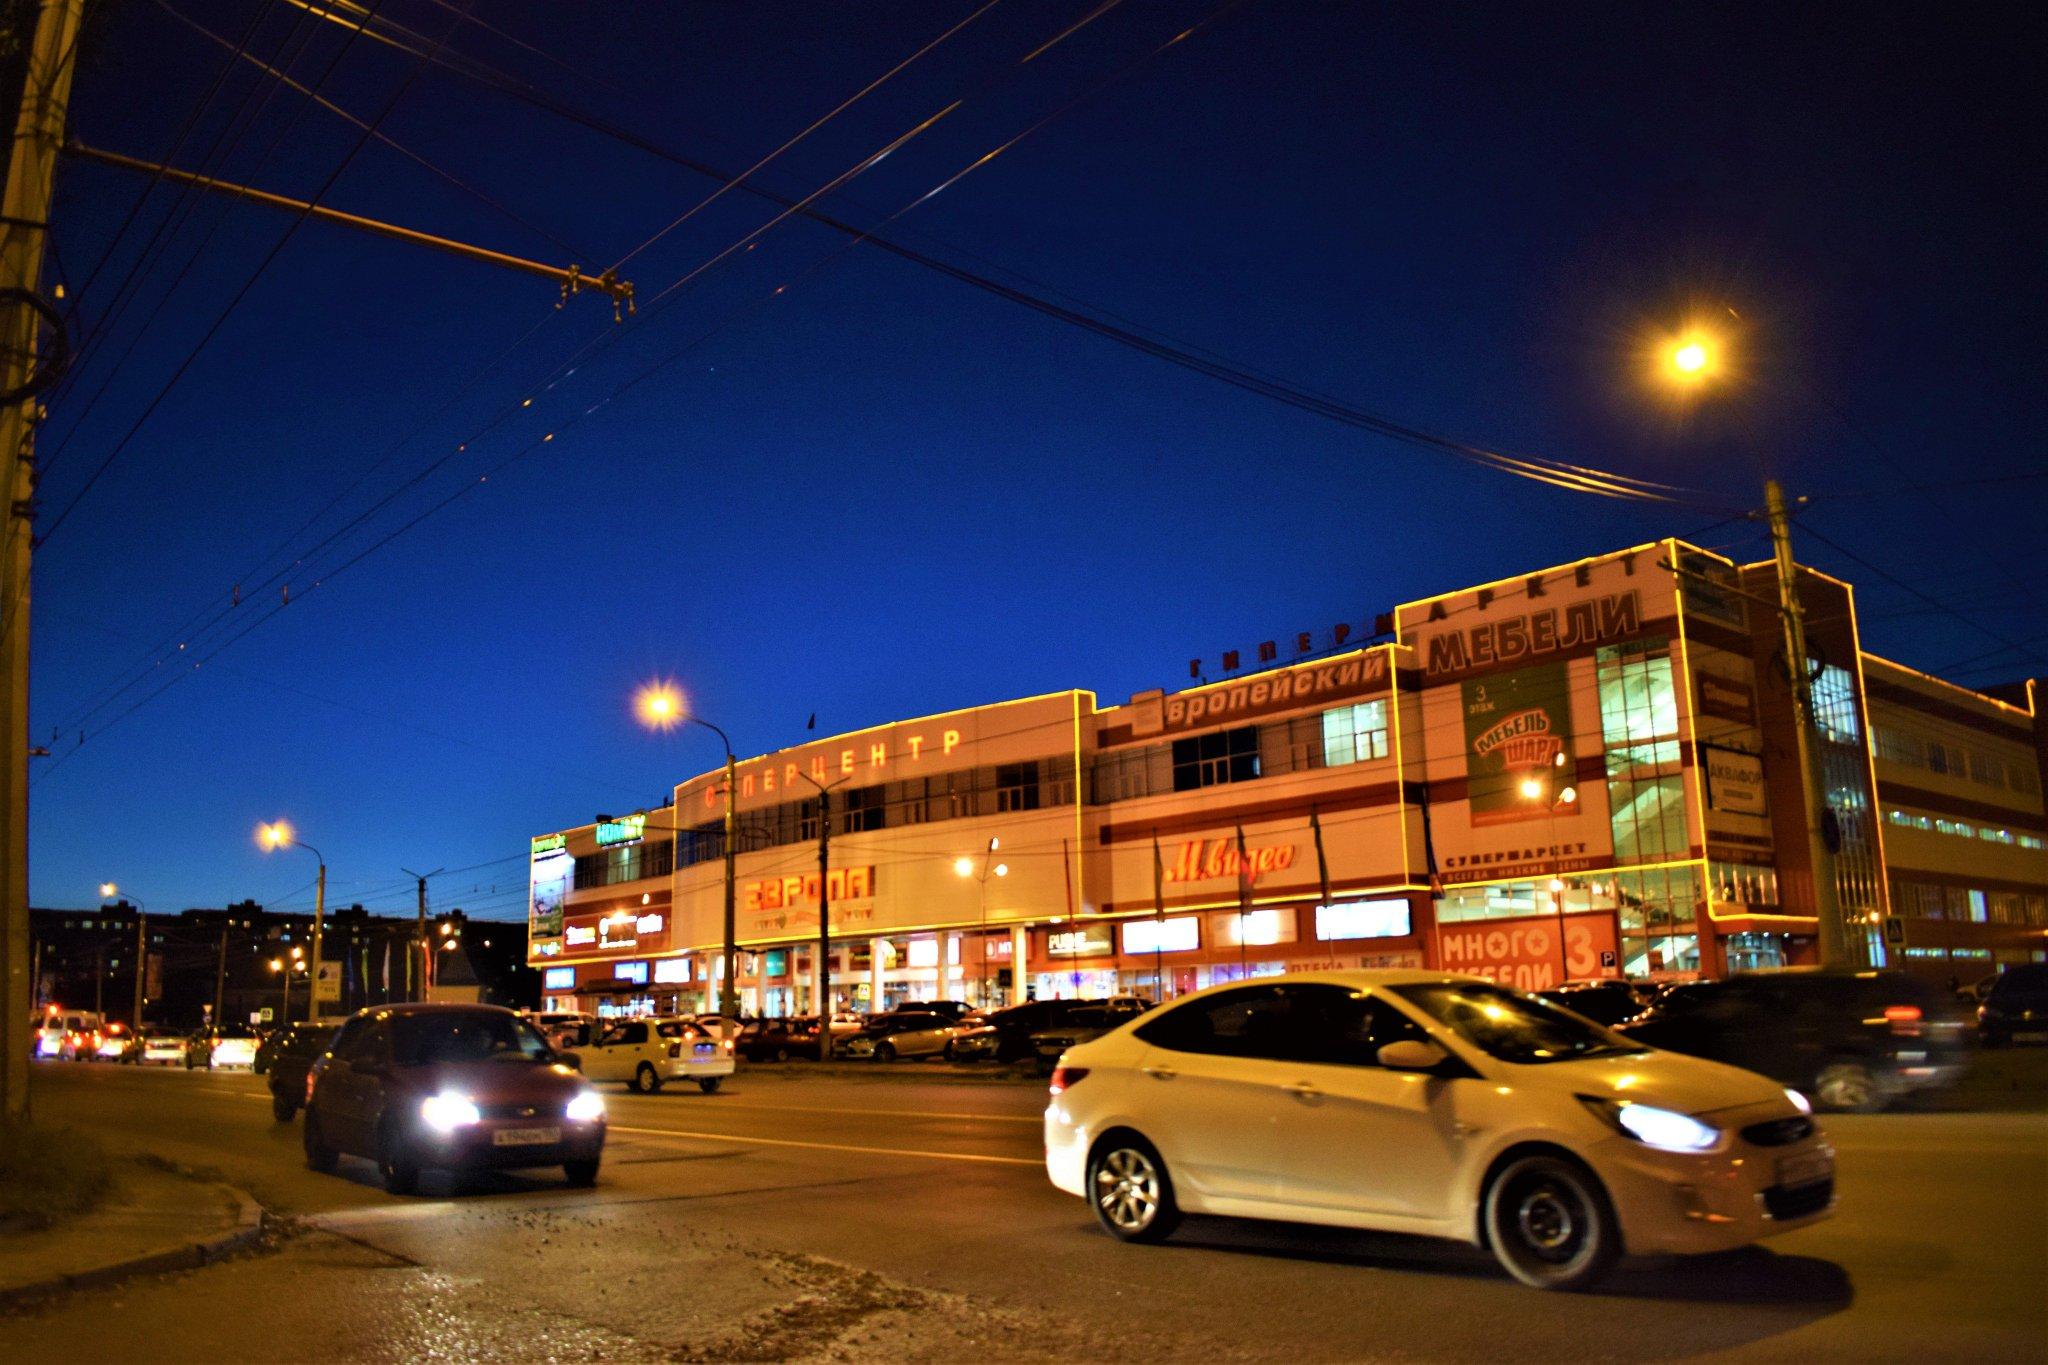 больше курск ночью фото барельефы